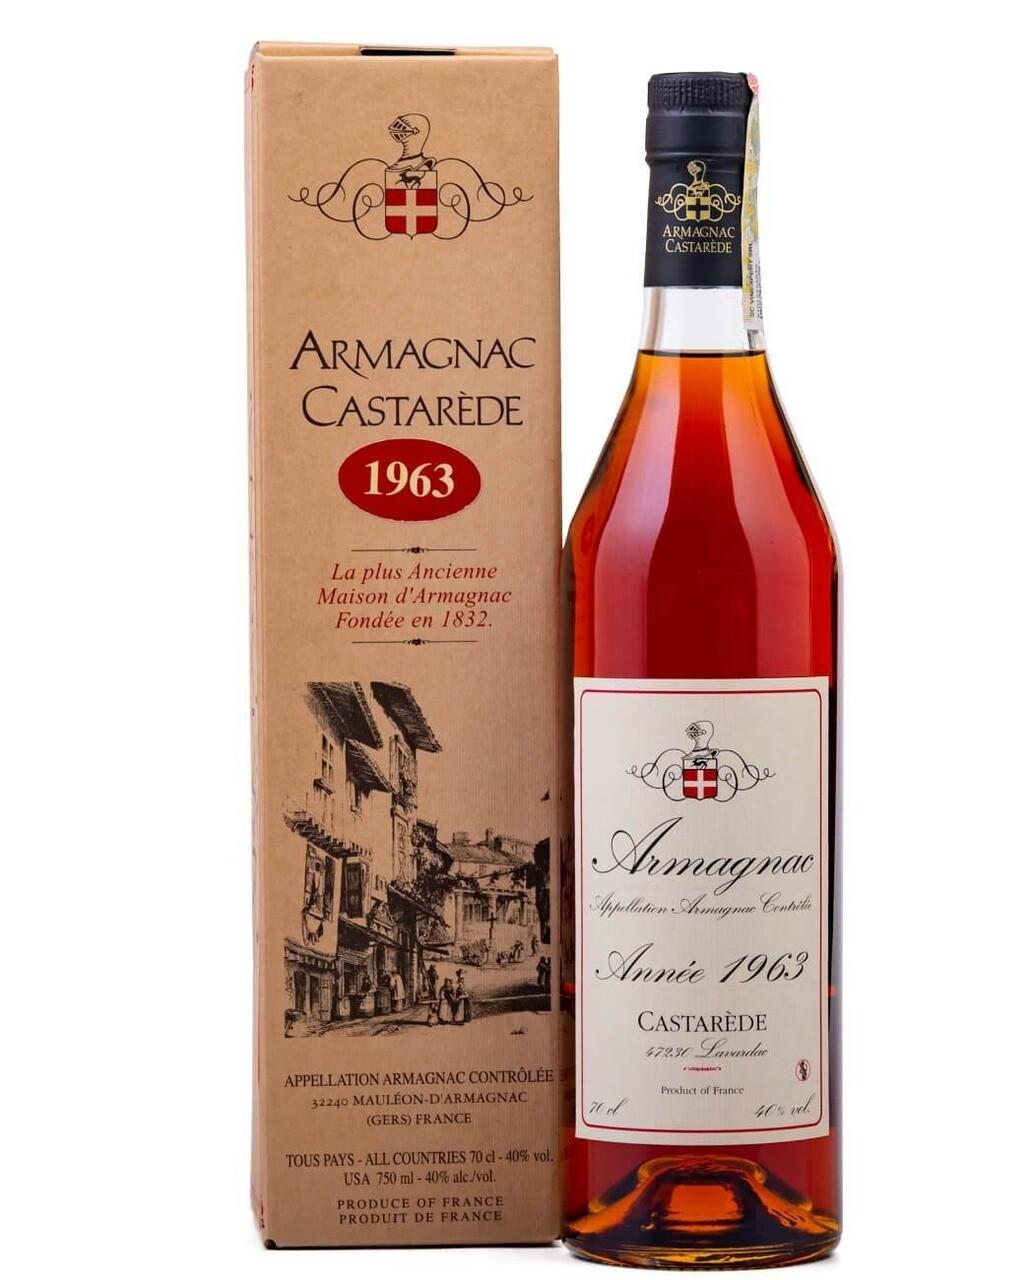 Armagnac Castarede 1963